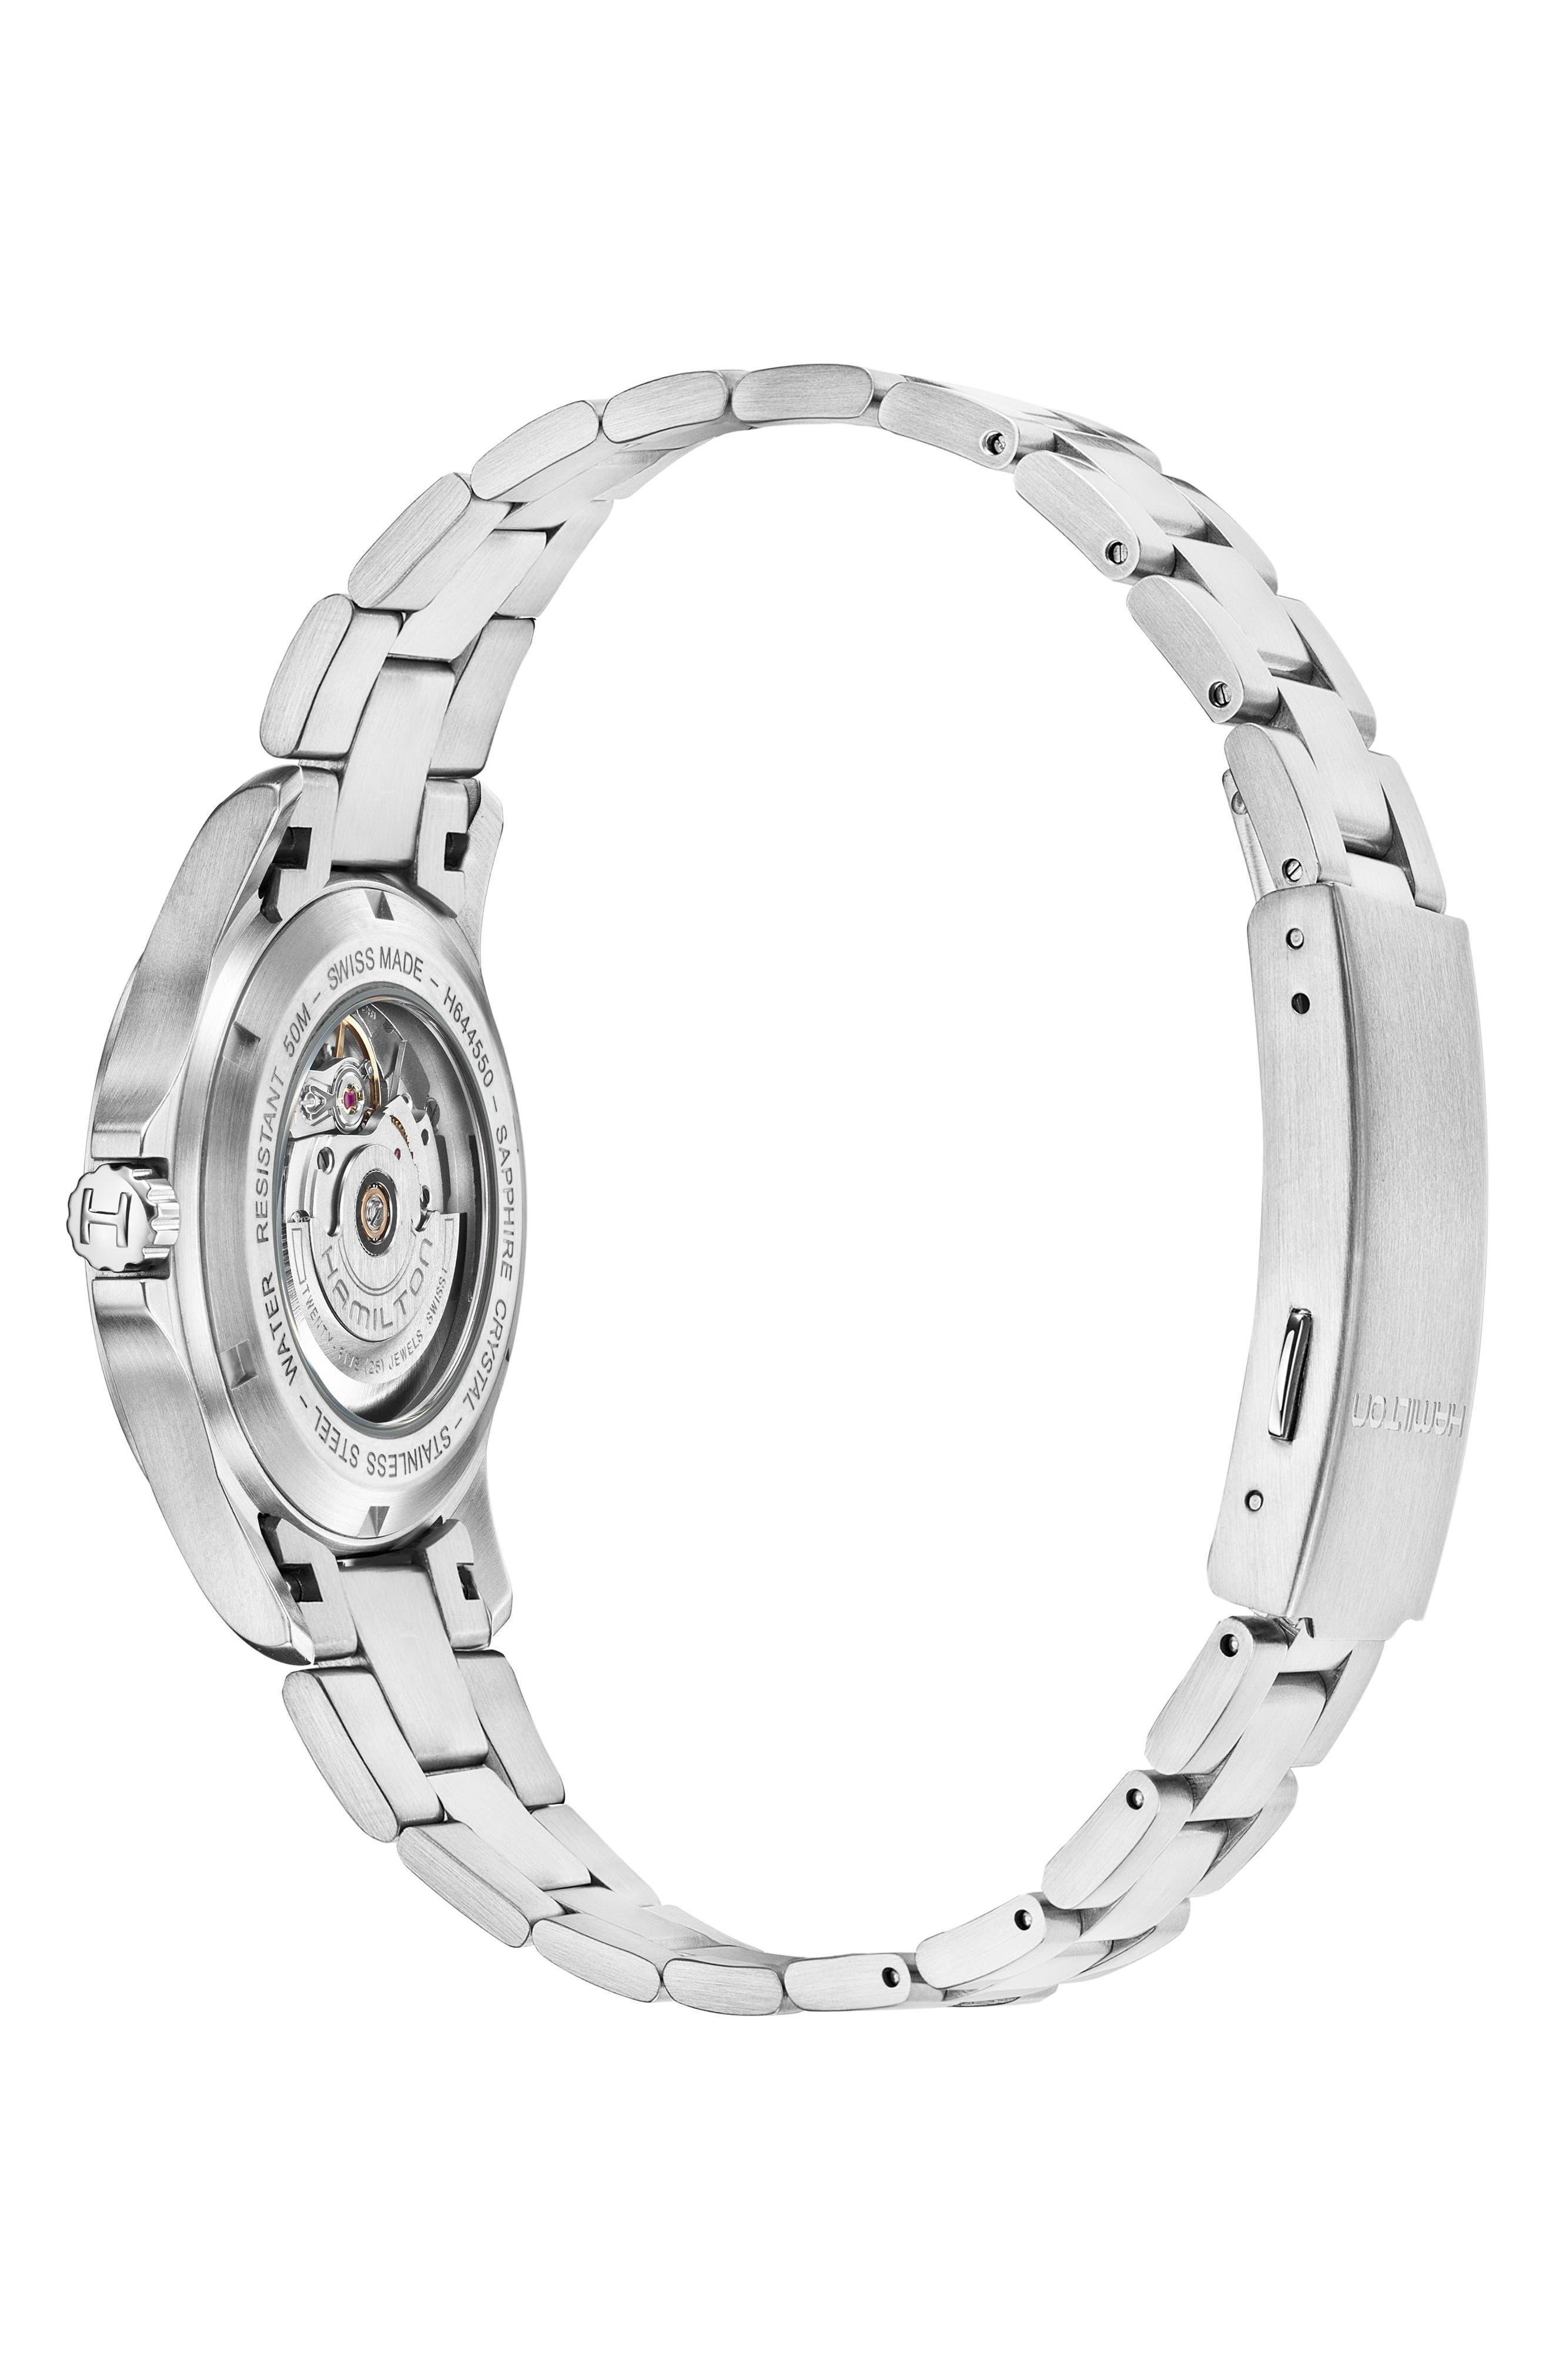 Khaki Field King Automatic Bracelet Watch, 40mm,                             Alternate thumbnail 3, color,                             SILVER/ BLACK/ SILVER